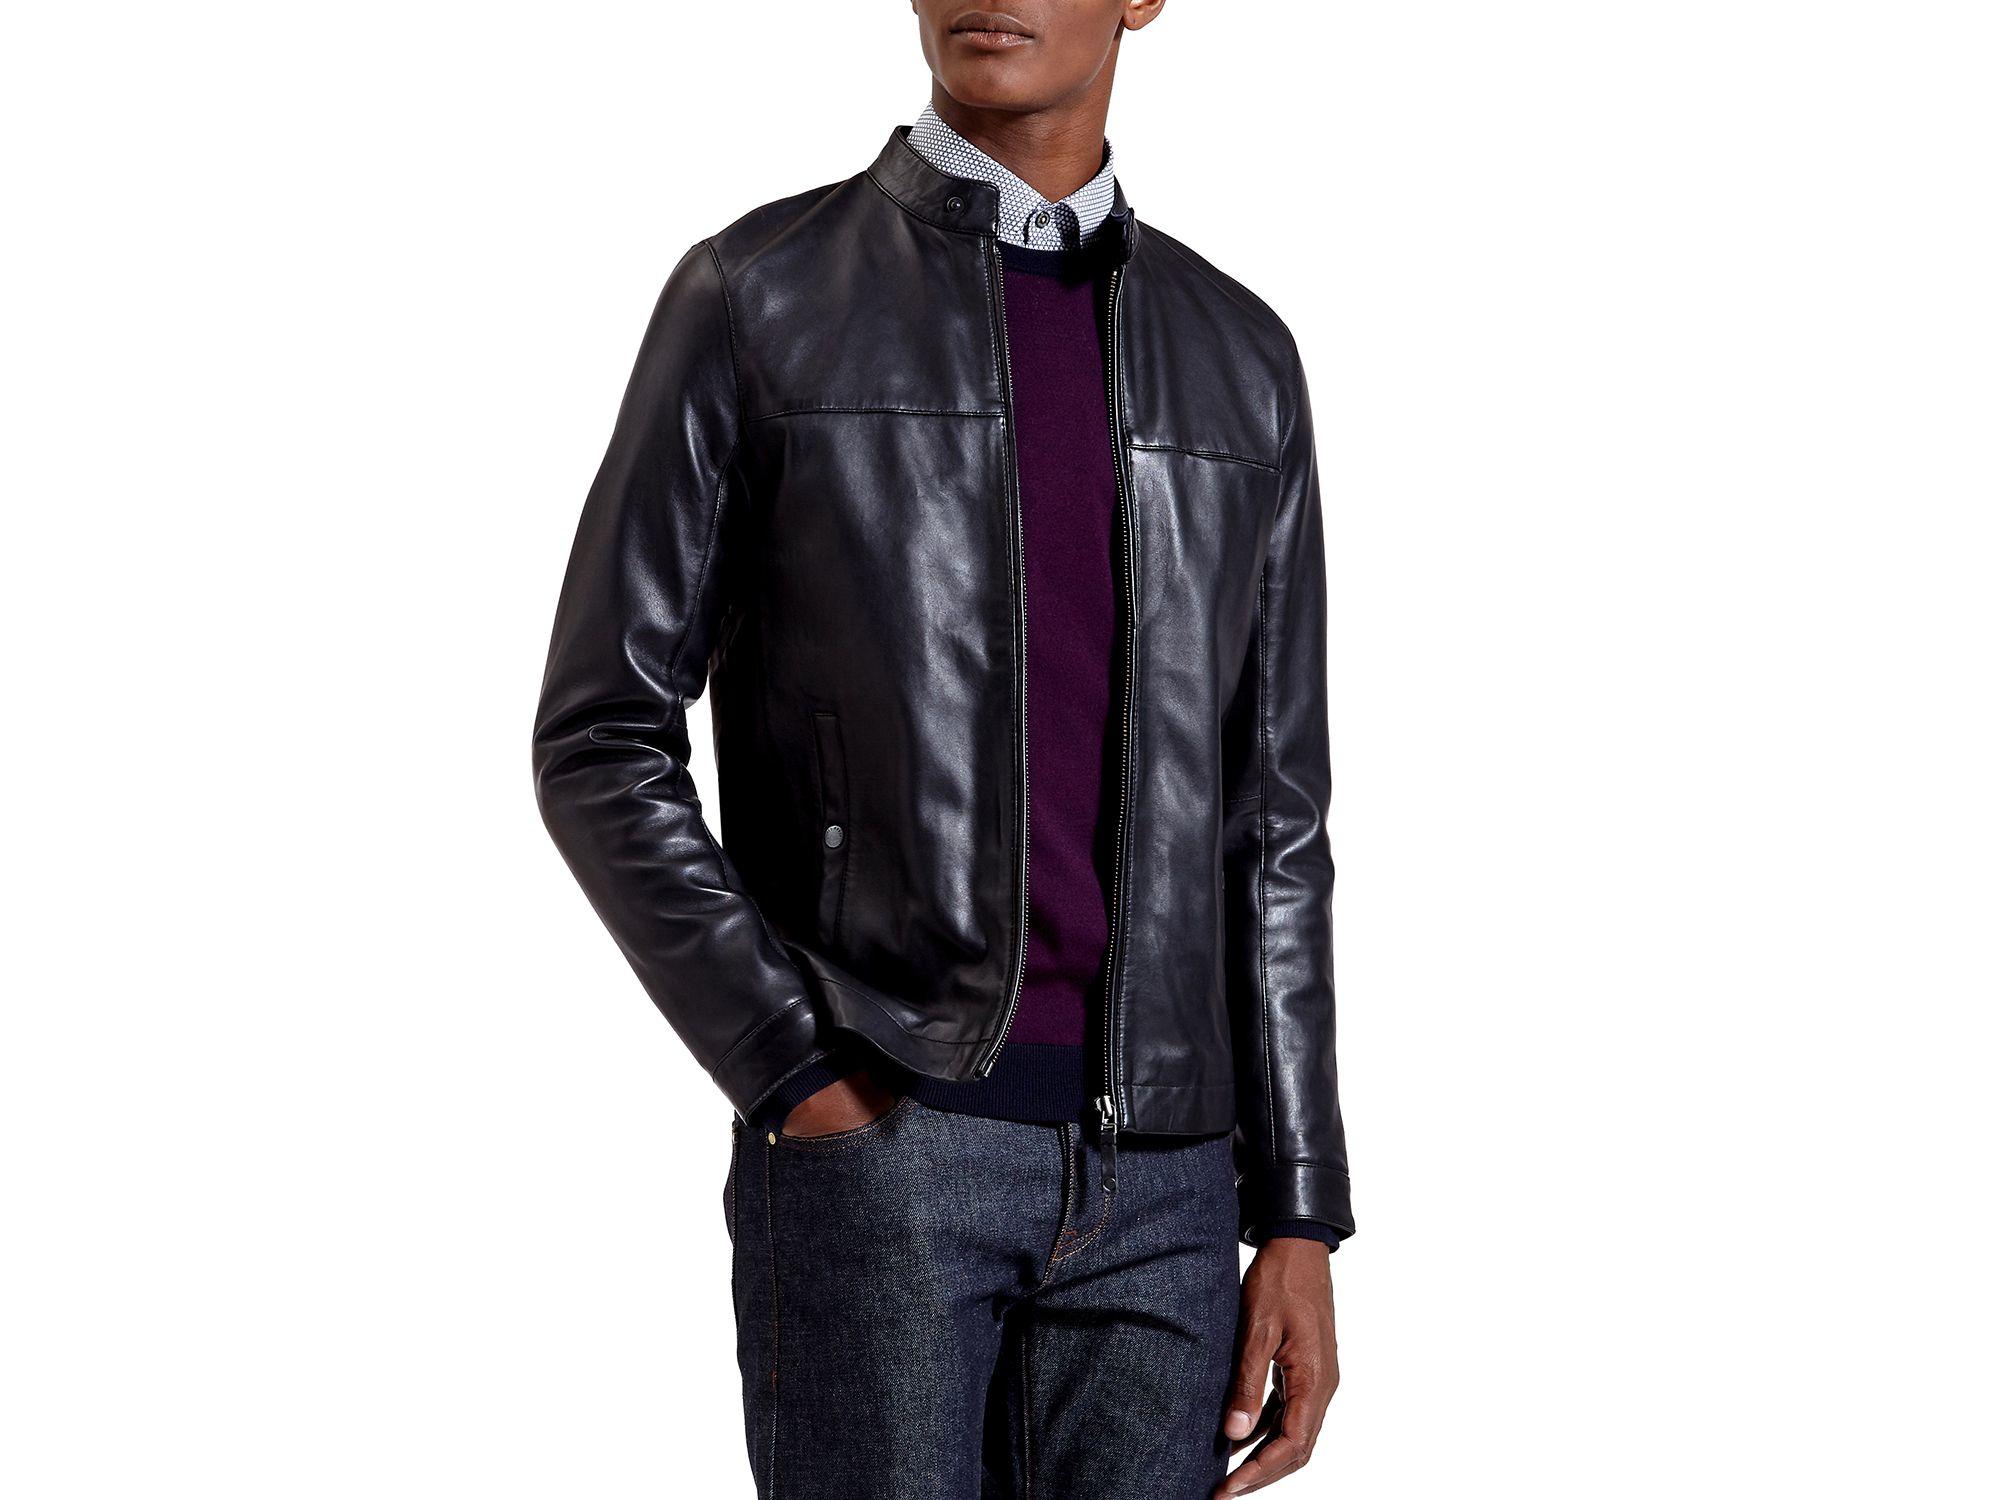 b8b9dd840 Lyst - Ted Baker Lapeer Leather Jacket in Black for Men